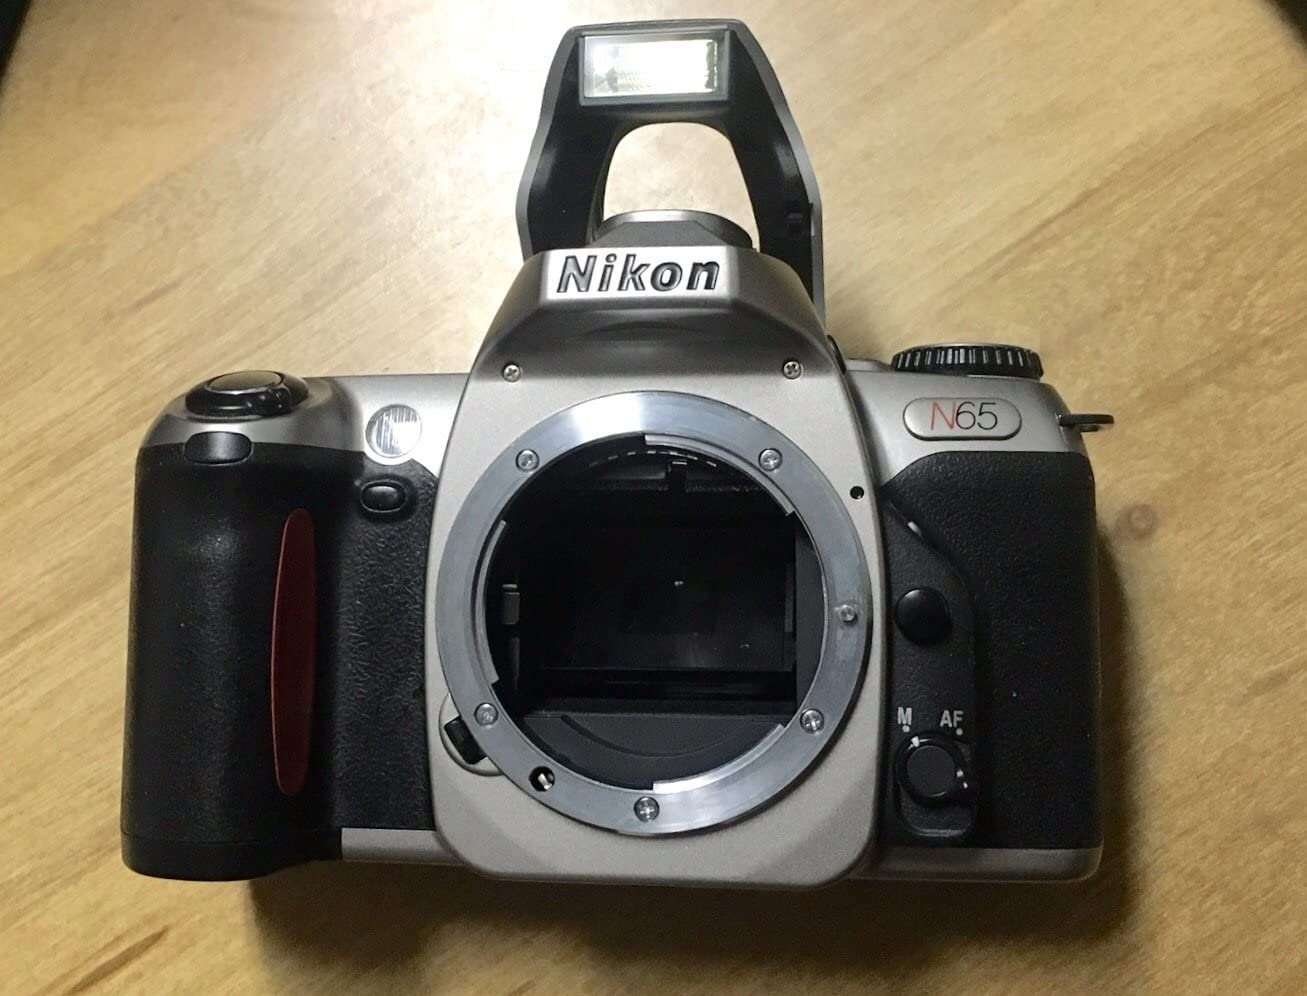 Nikon F65 35mm SLR Camera Body Only in Silver, (F65 = N65)